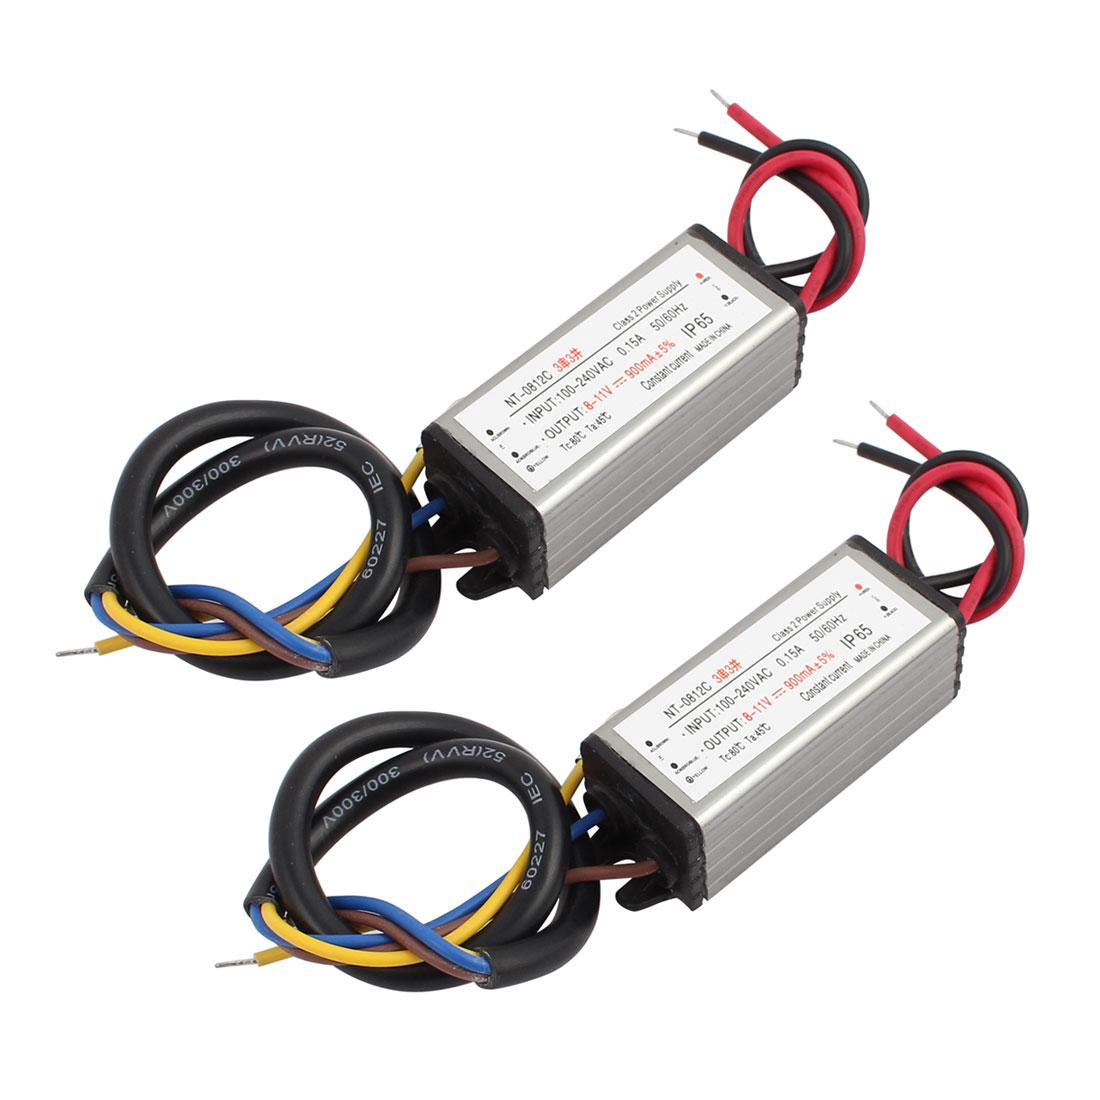 2Pcs AC100-240V to DC8-11V Transformer IP65 Waterproof LED Driver Power Supply